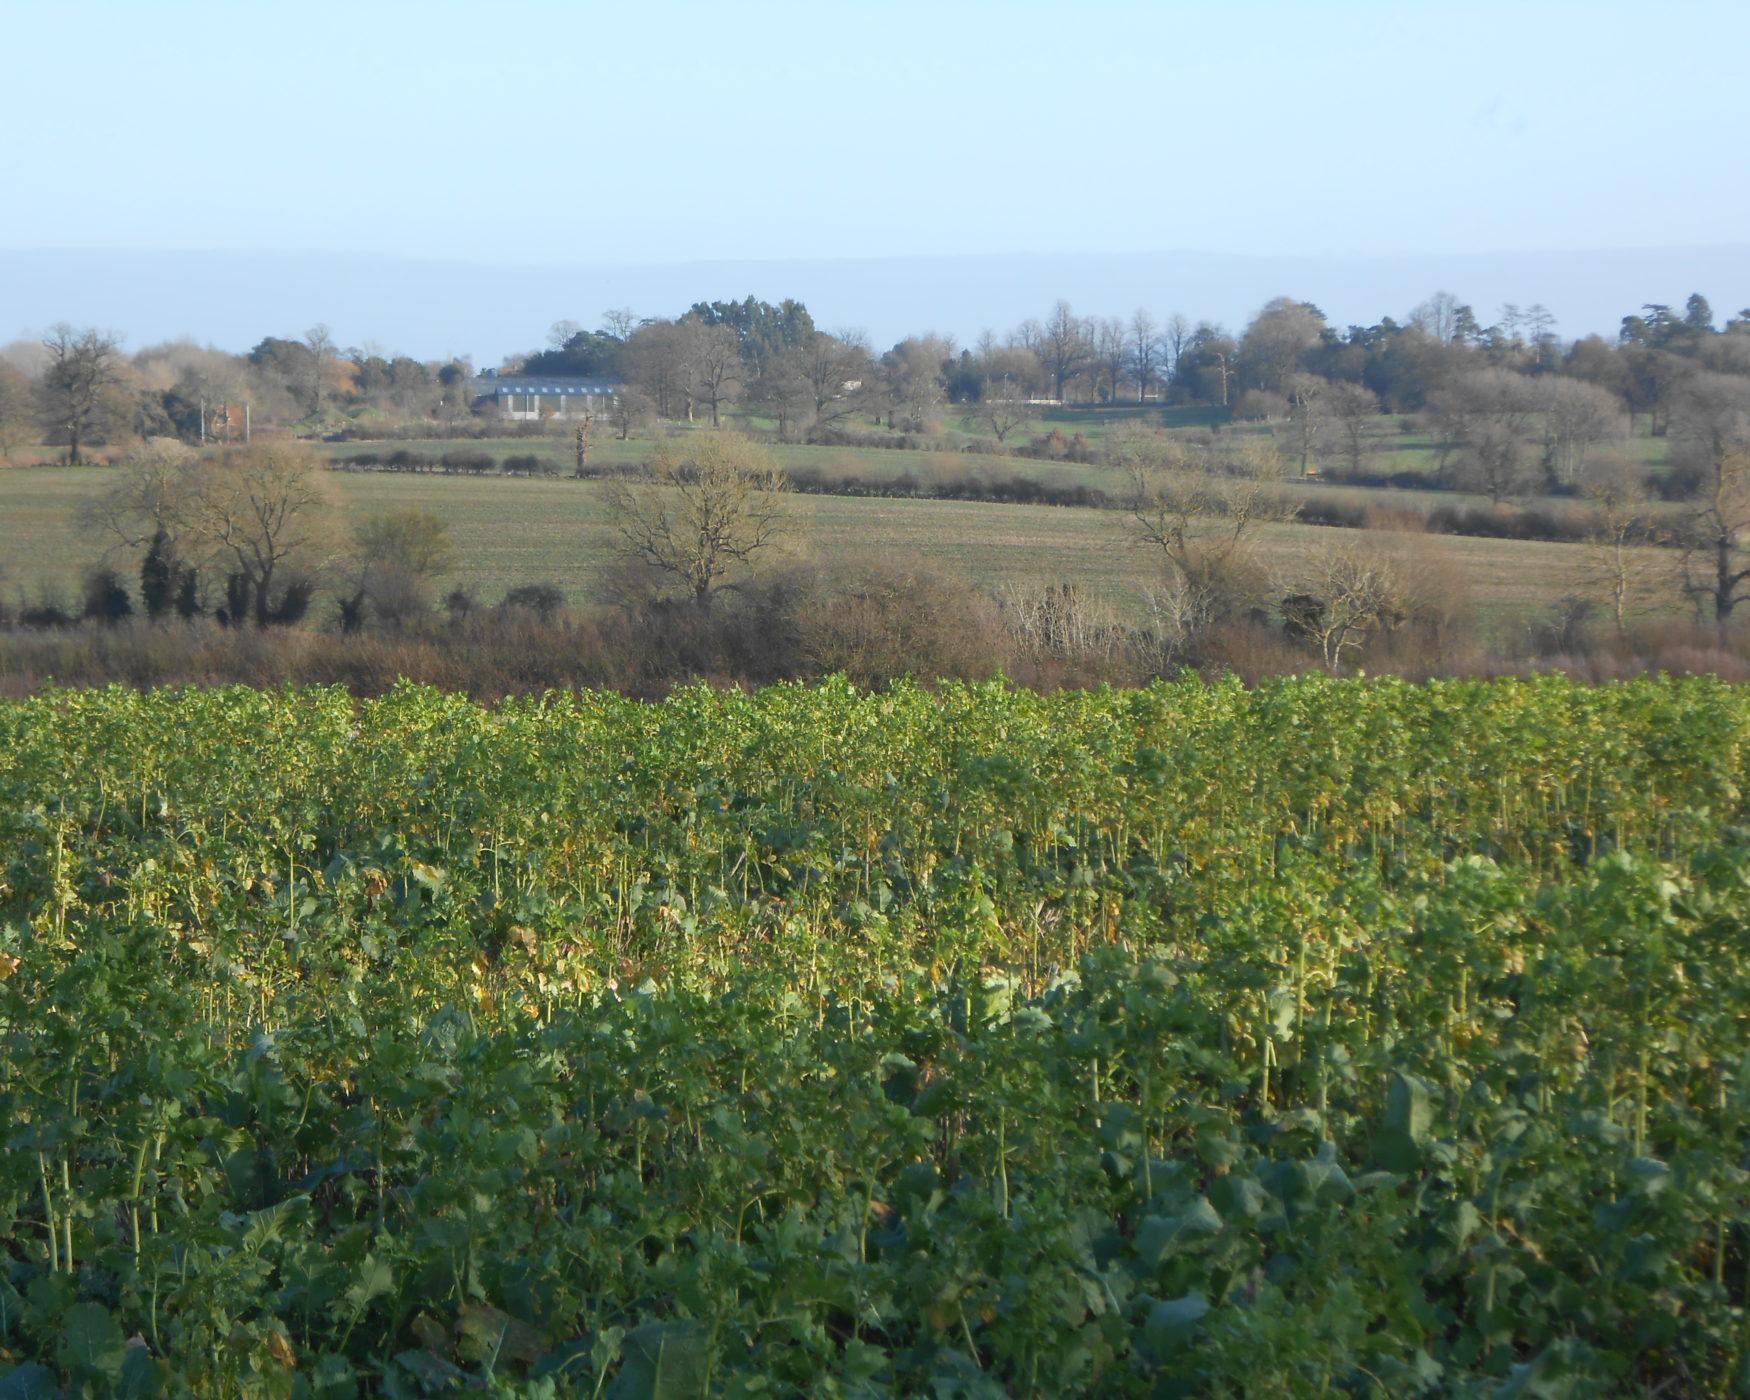 View from Cross Bucks Way towards Winslow